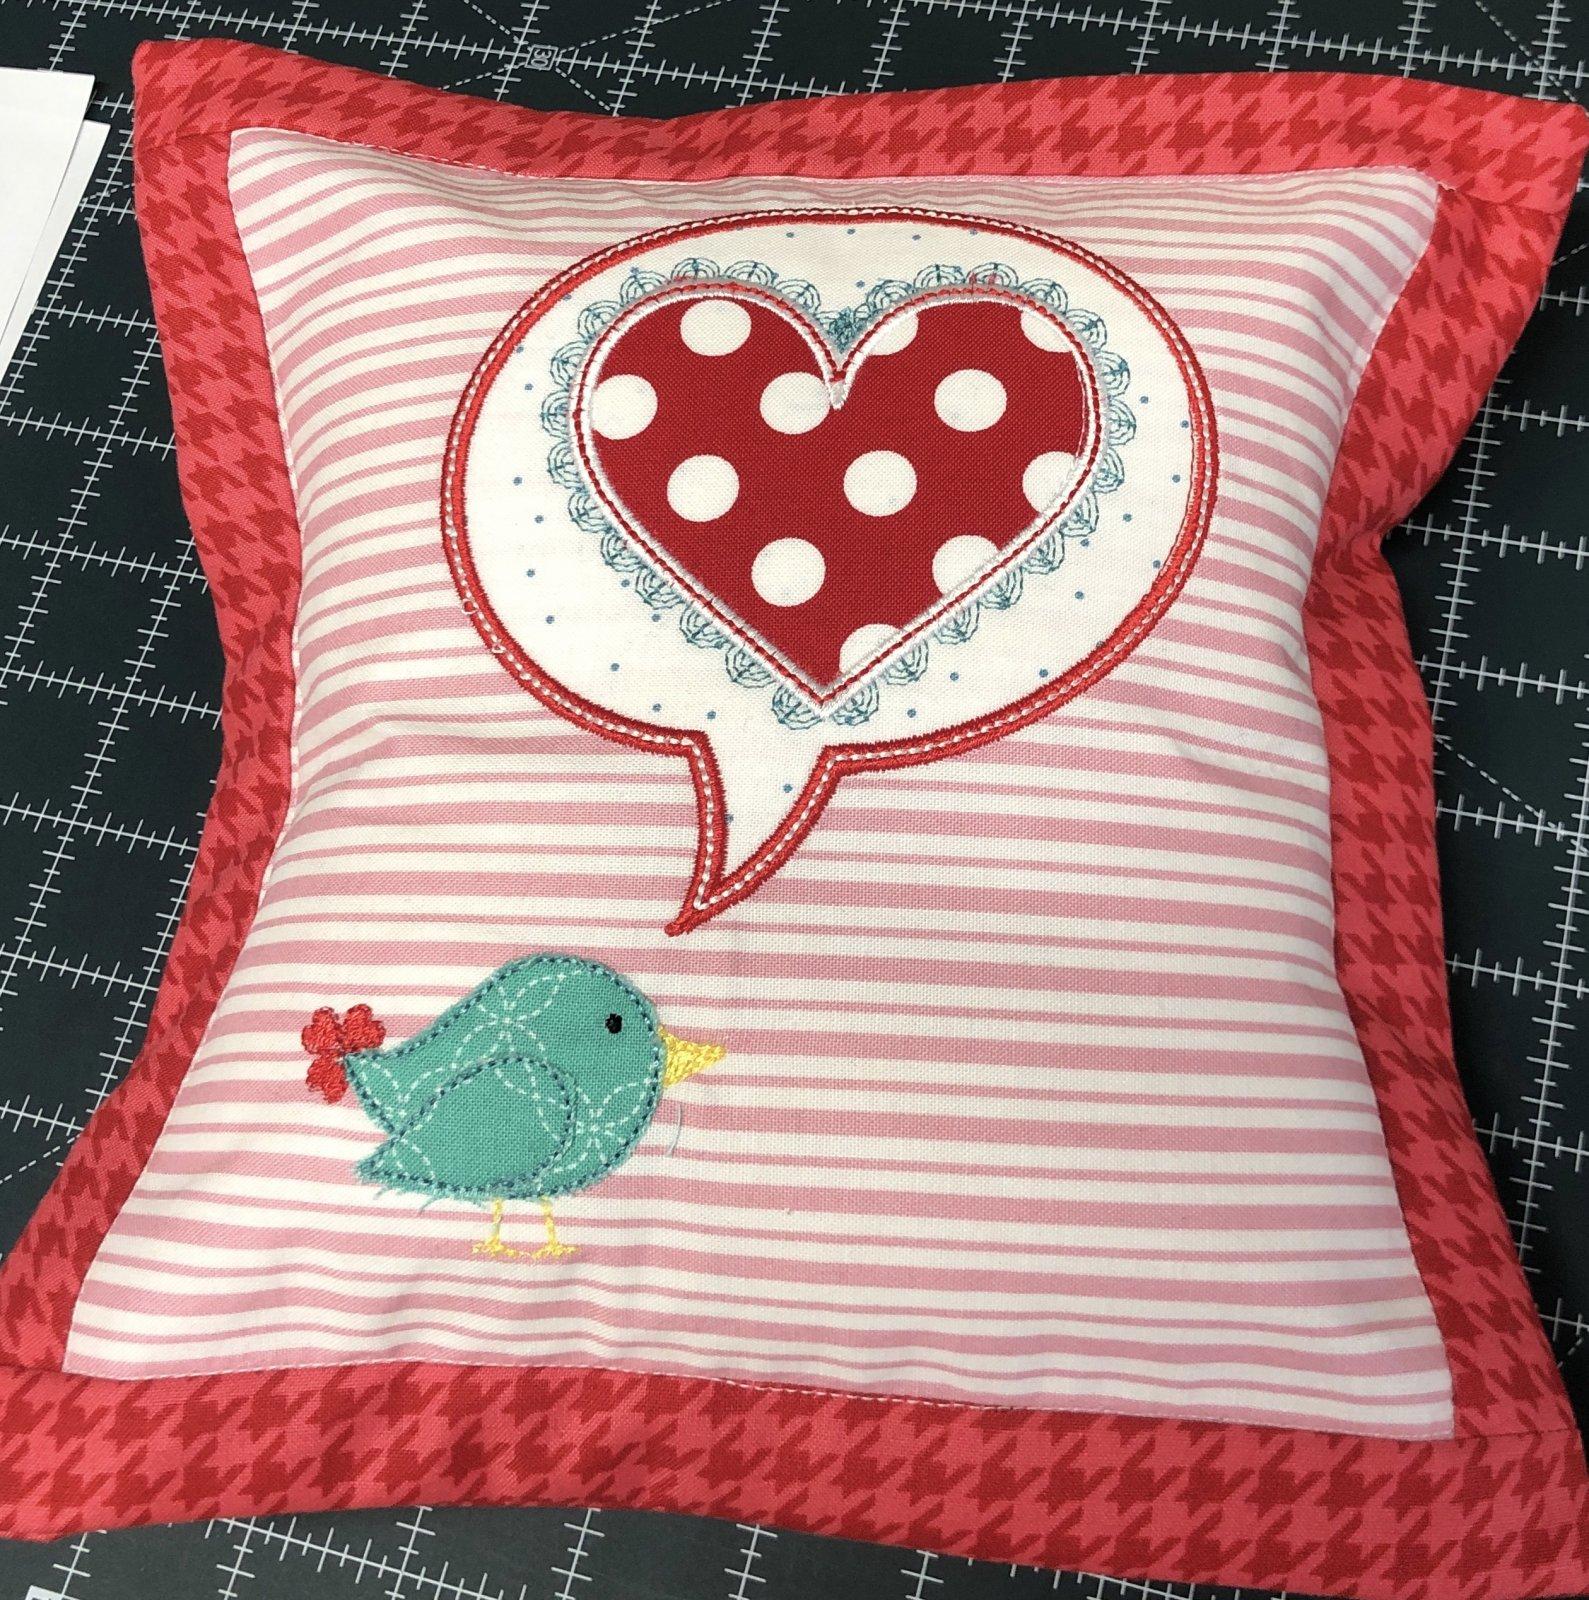 A Little Birdie Told Me Pillow Kit